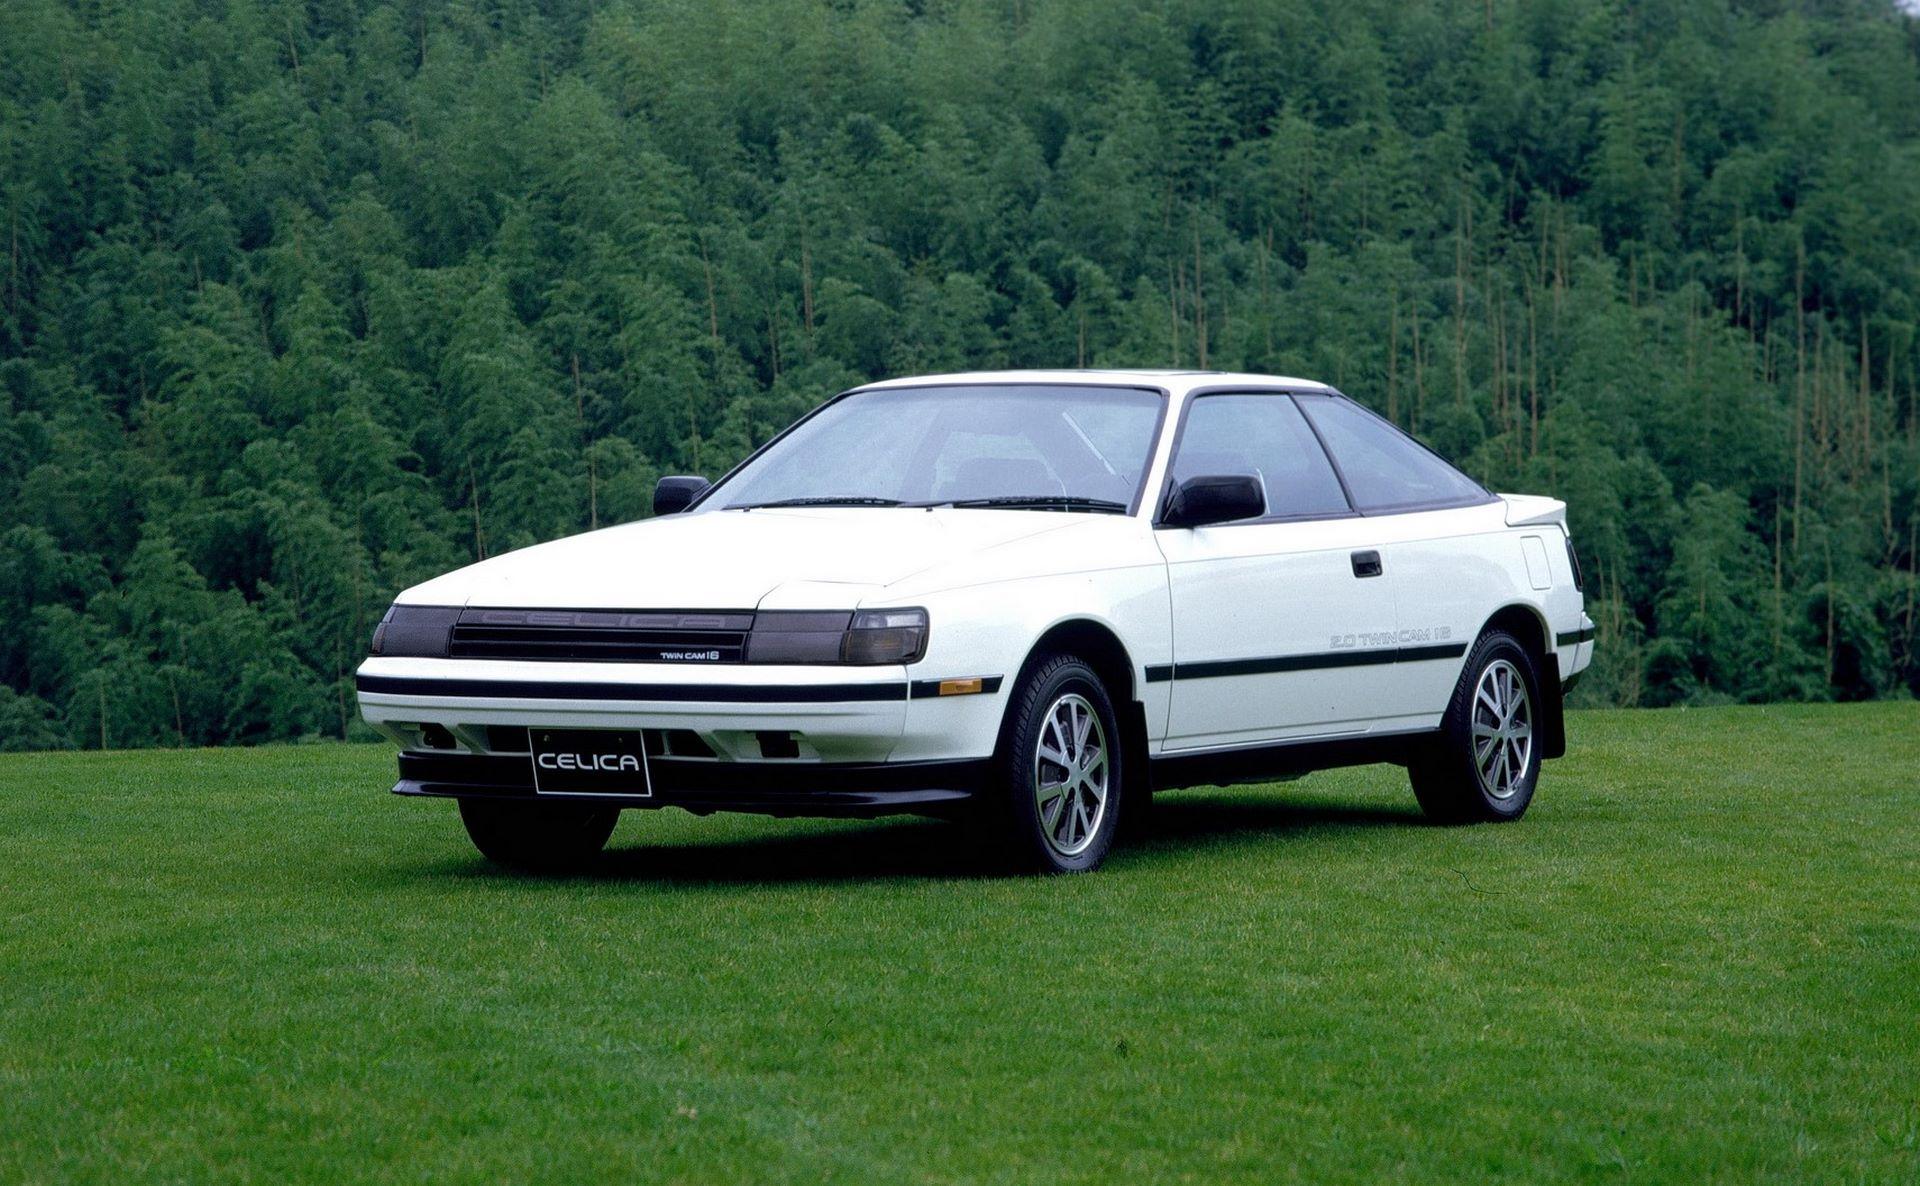 Toyota-Celica-50-years-15